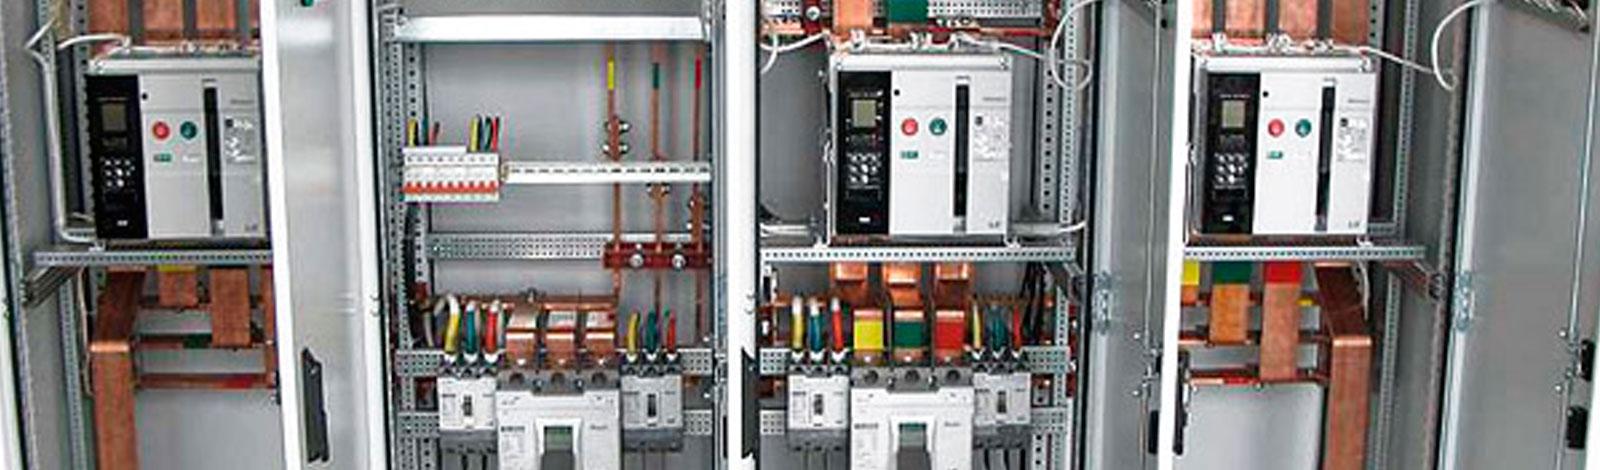 Частный электрик санкт петербург